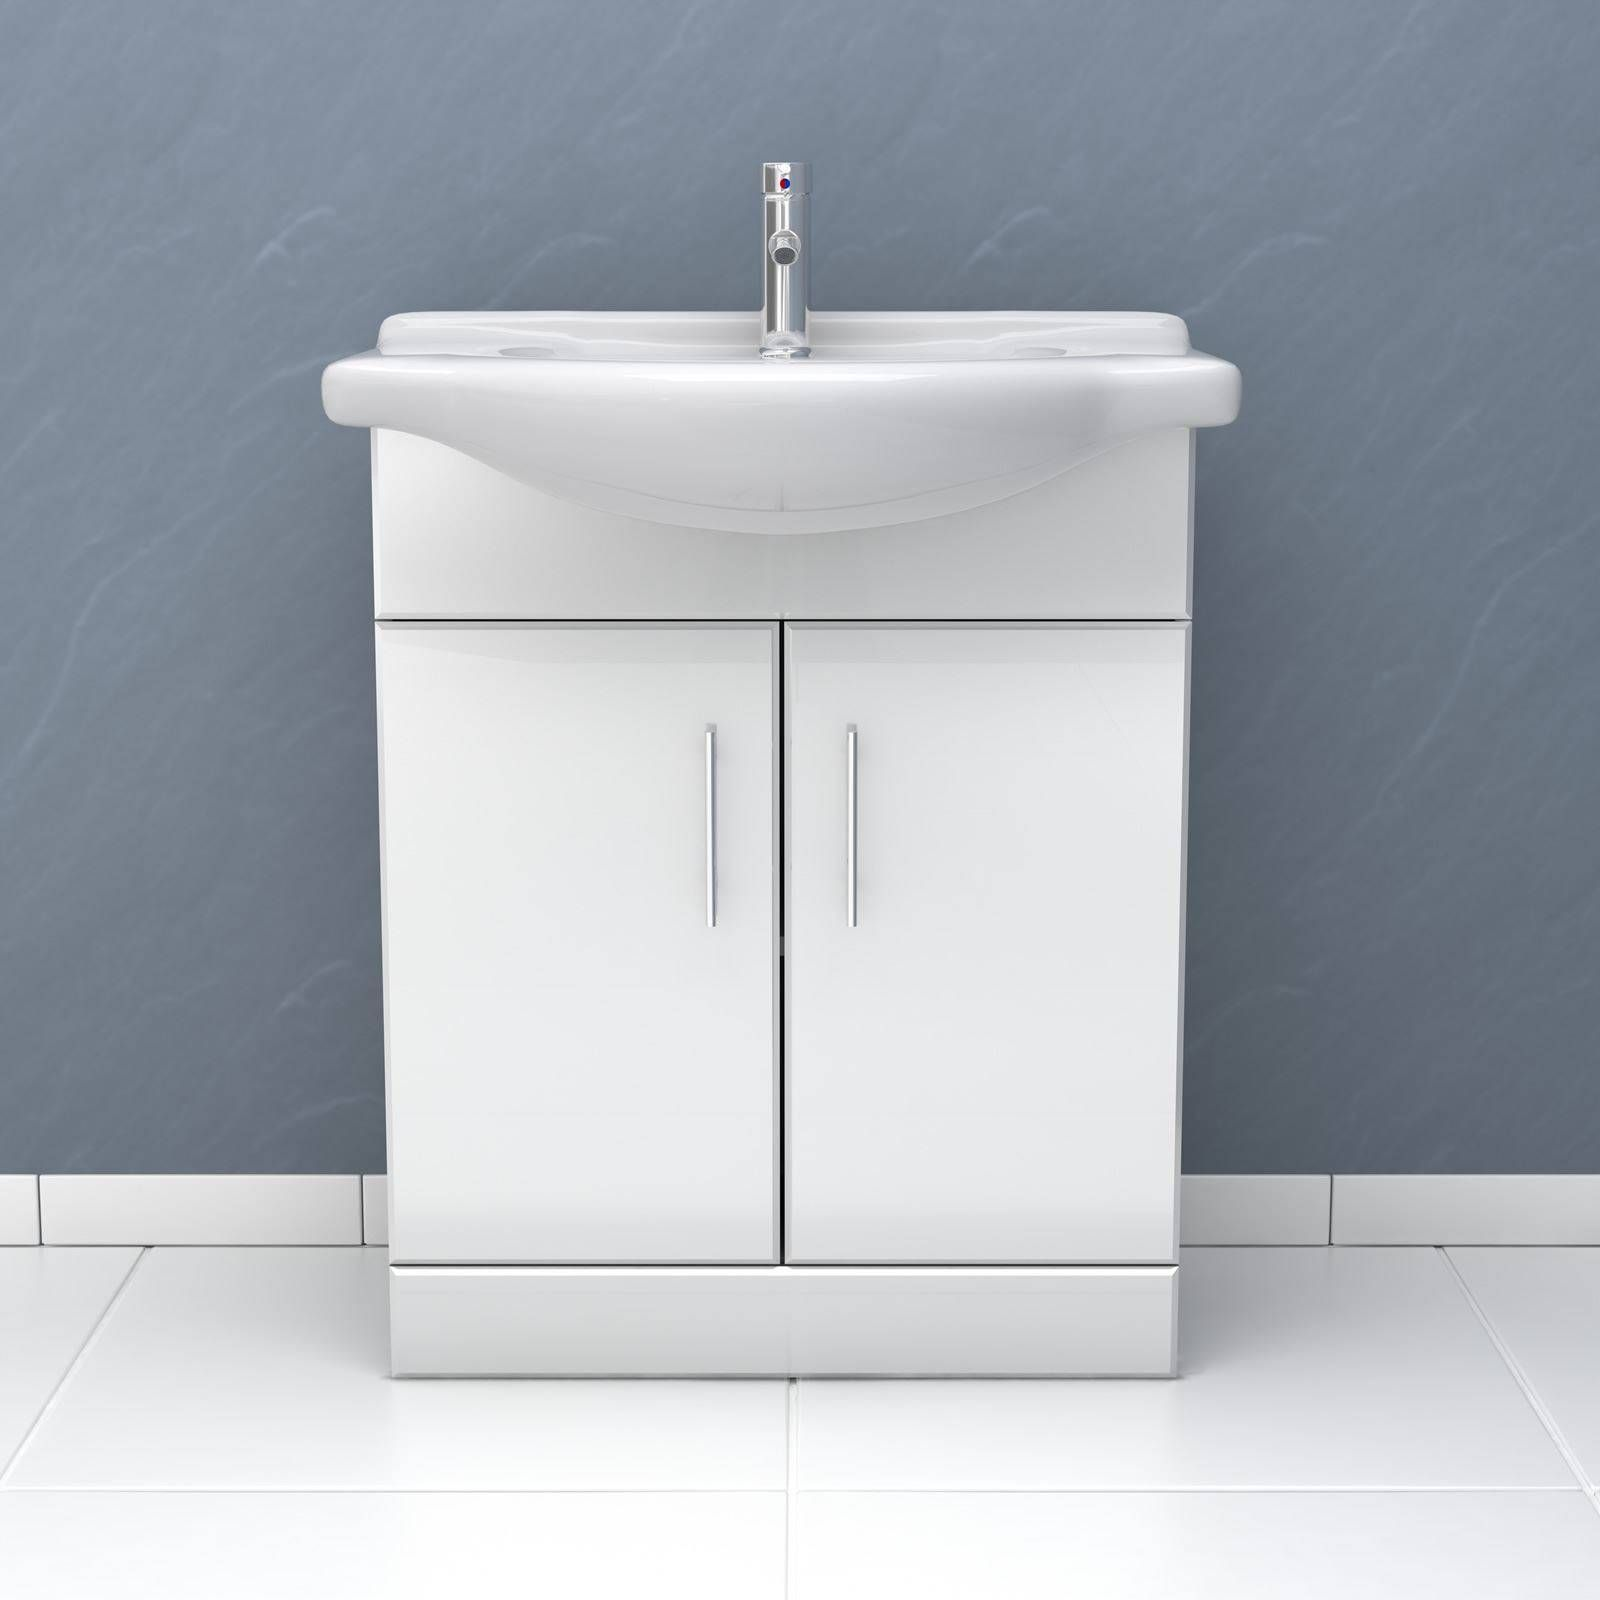 1500mm Bathroom Vanity Unique 1500mm 1700mm P Shaped Shower Screen Bath Bathroom Suite Bathroom Vanity Vanity Bathroom